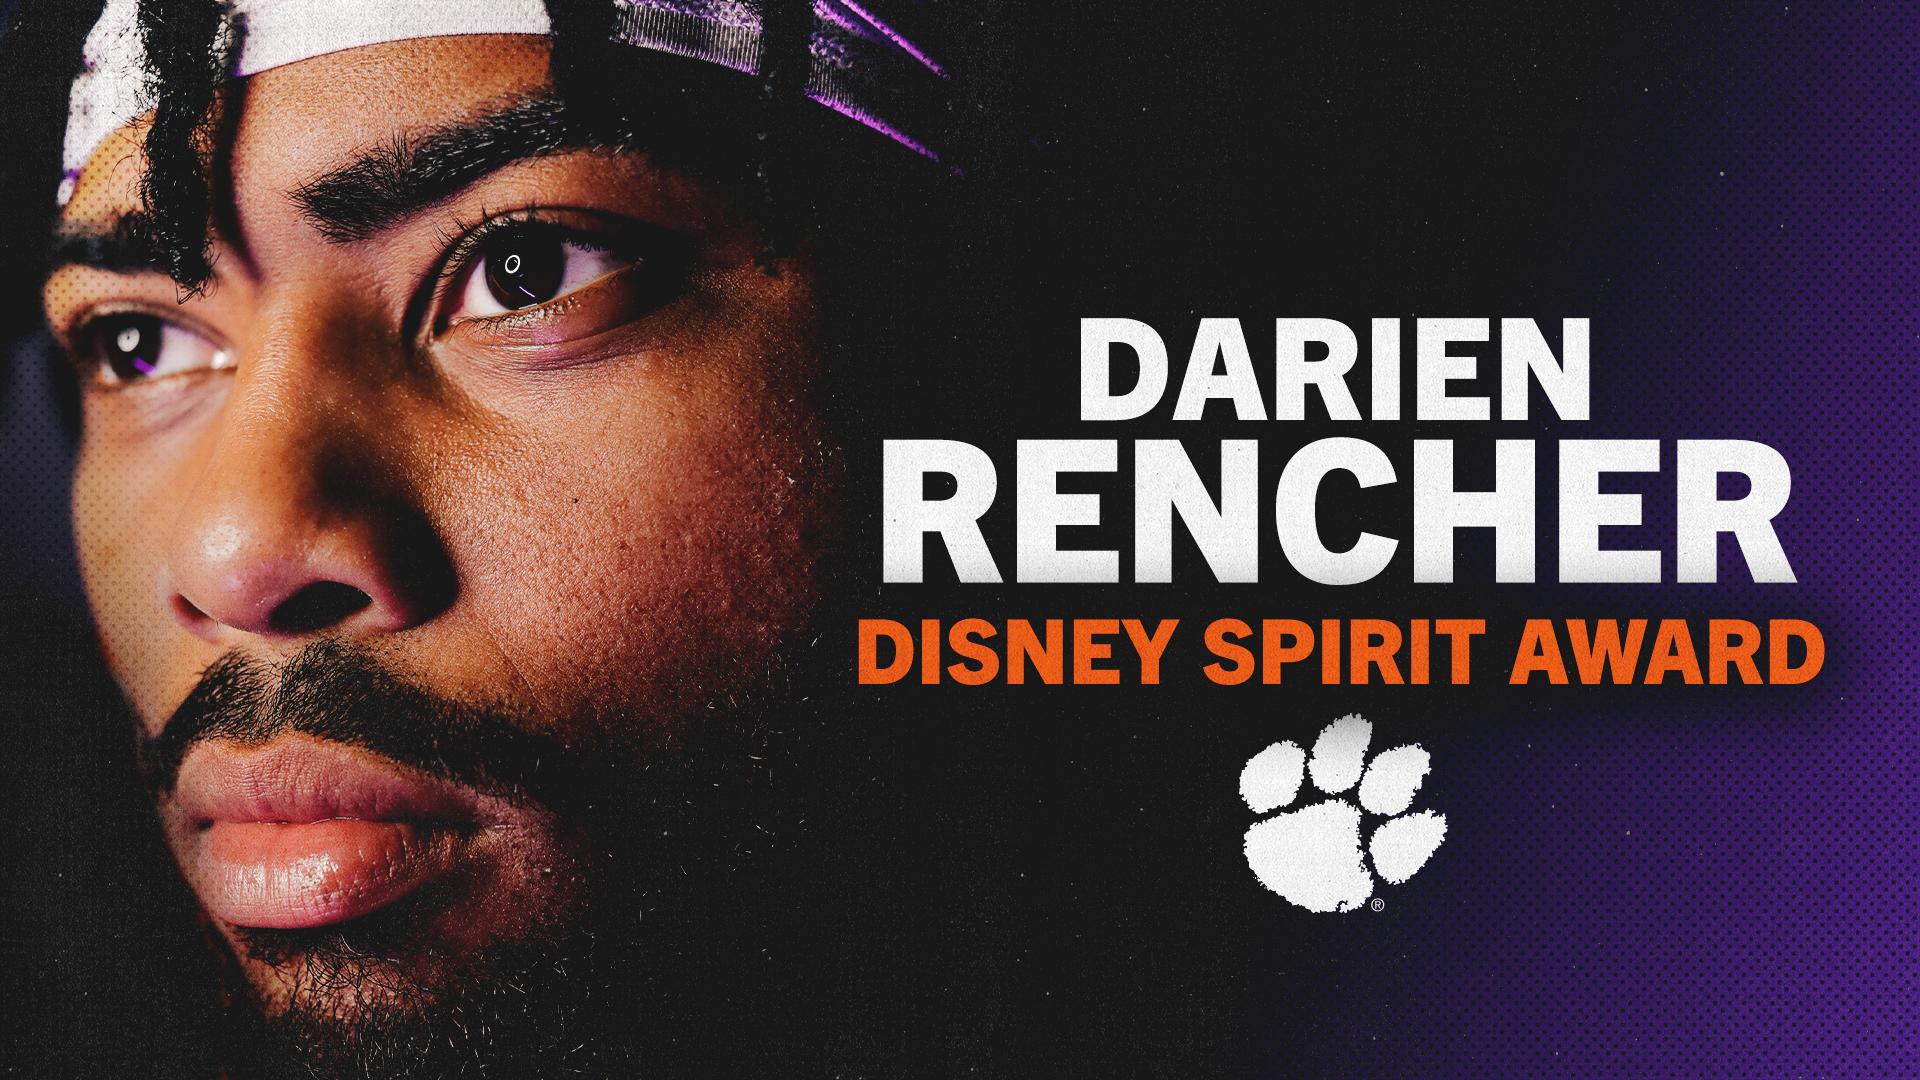 WATCH: Darien Rencher Wins Disney Spirit Award